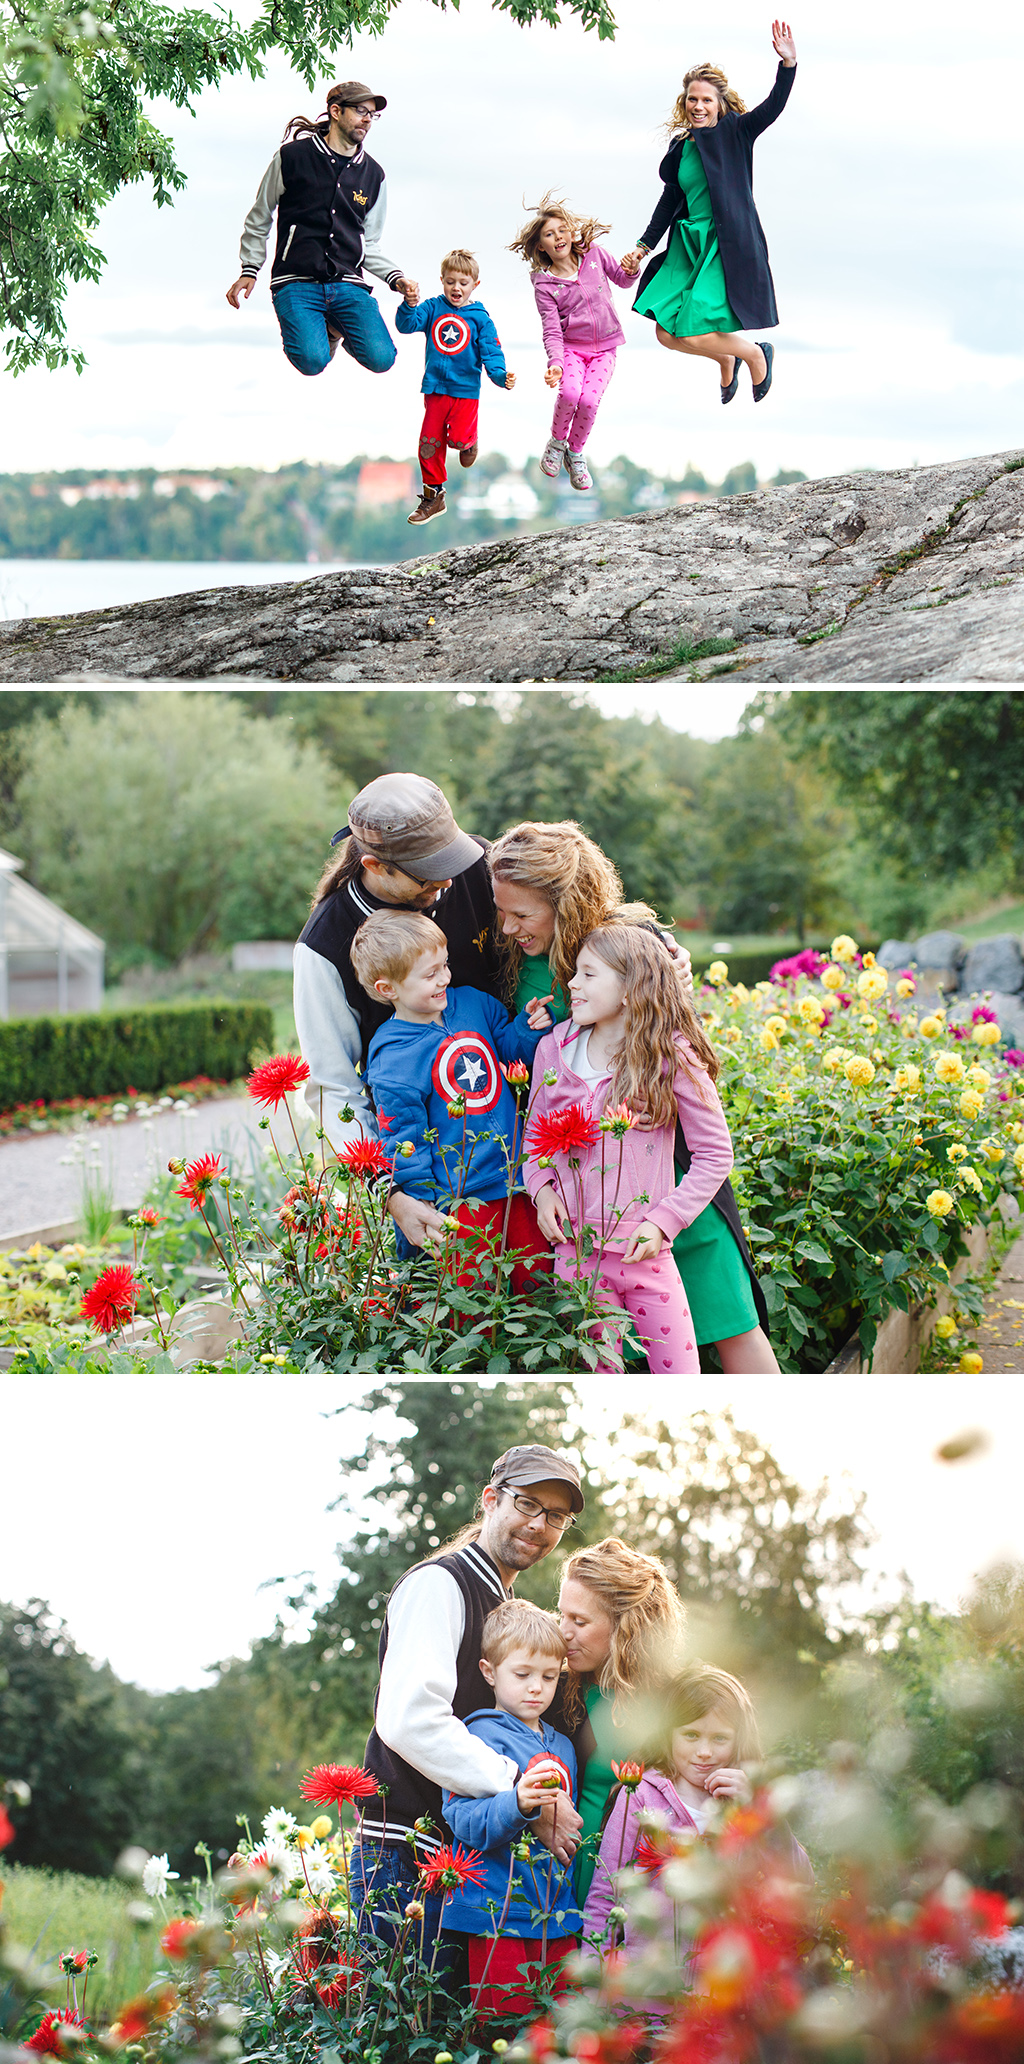 Hostfotografering_september_familjefotografering-i-stockholm-2.jpg